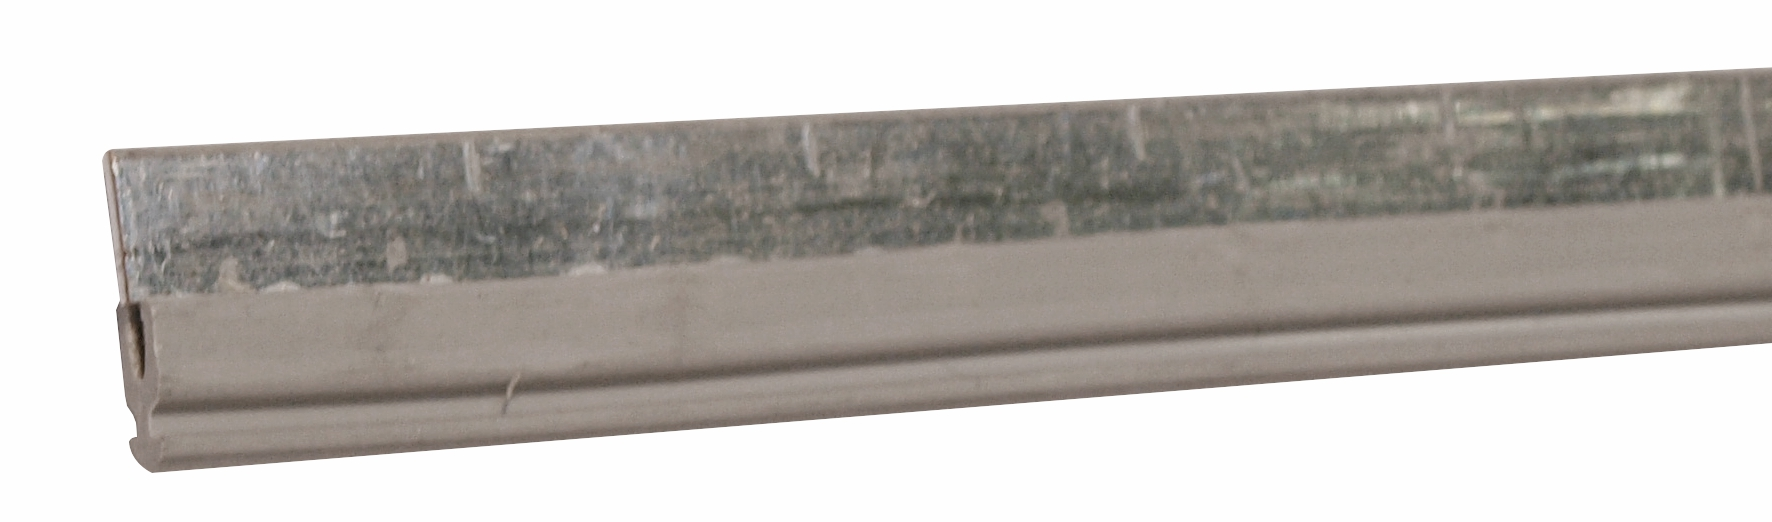 1 Stk SNR-Querbrückungskamm grau 500mm ST37003---